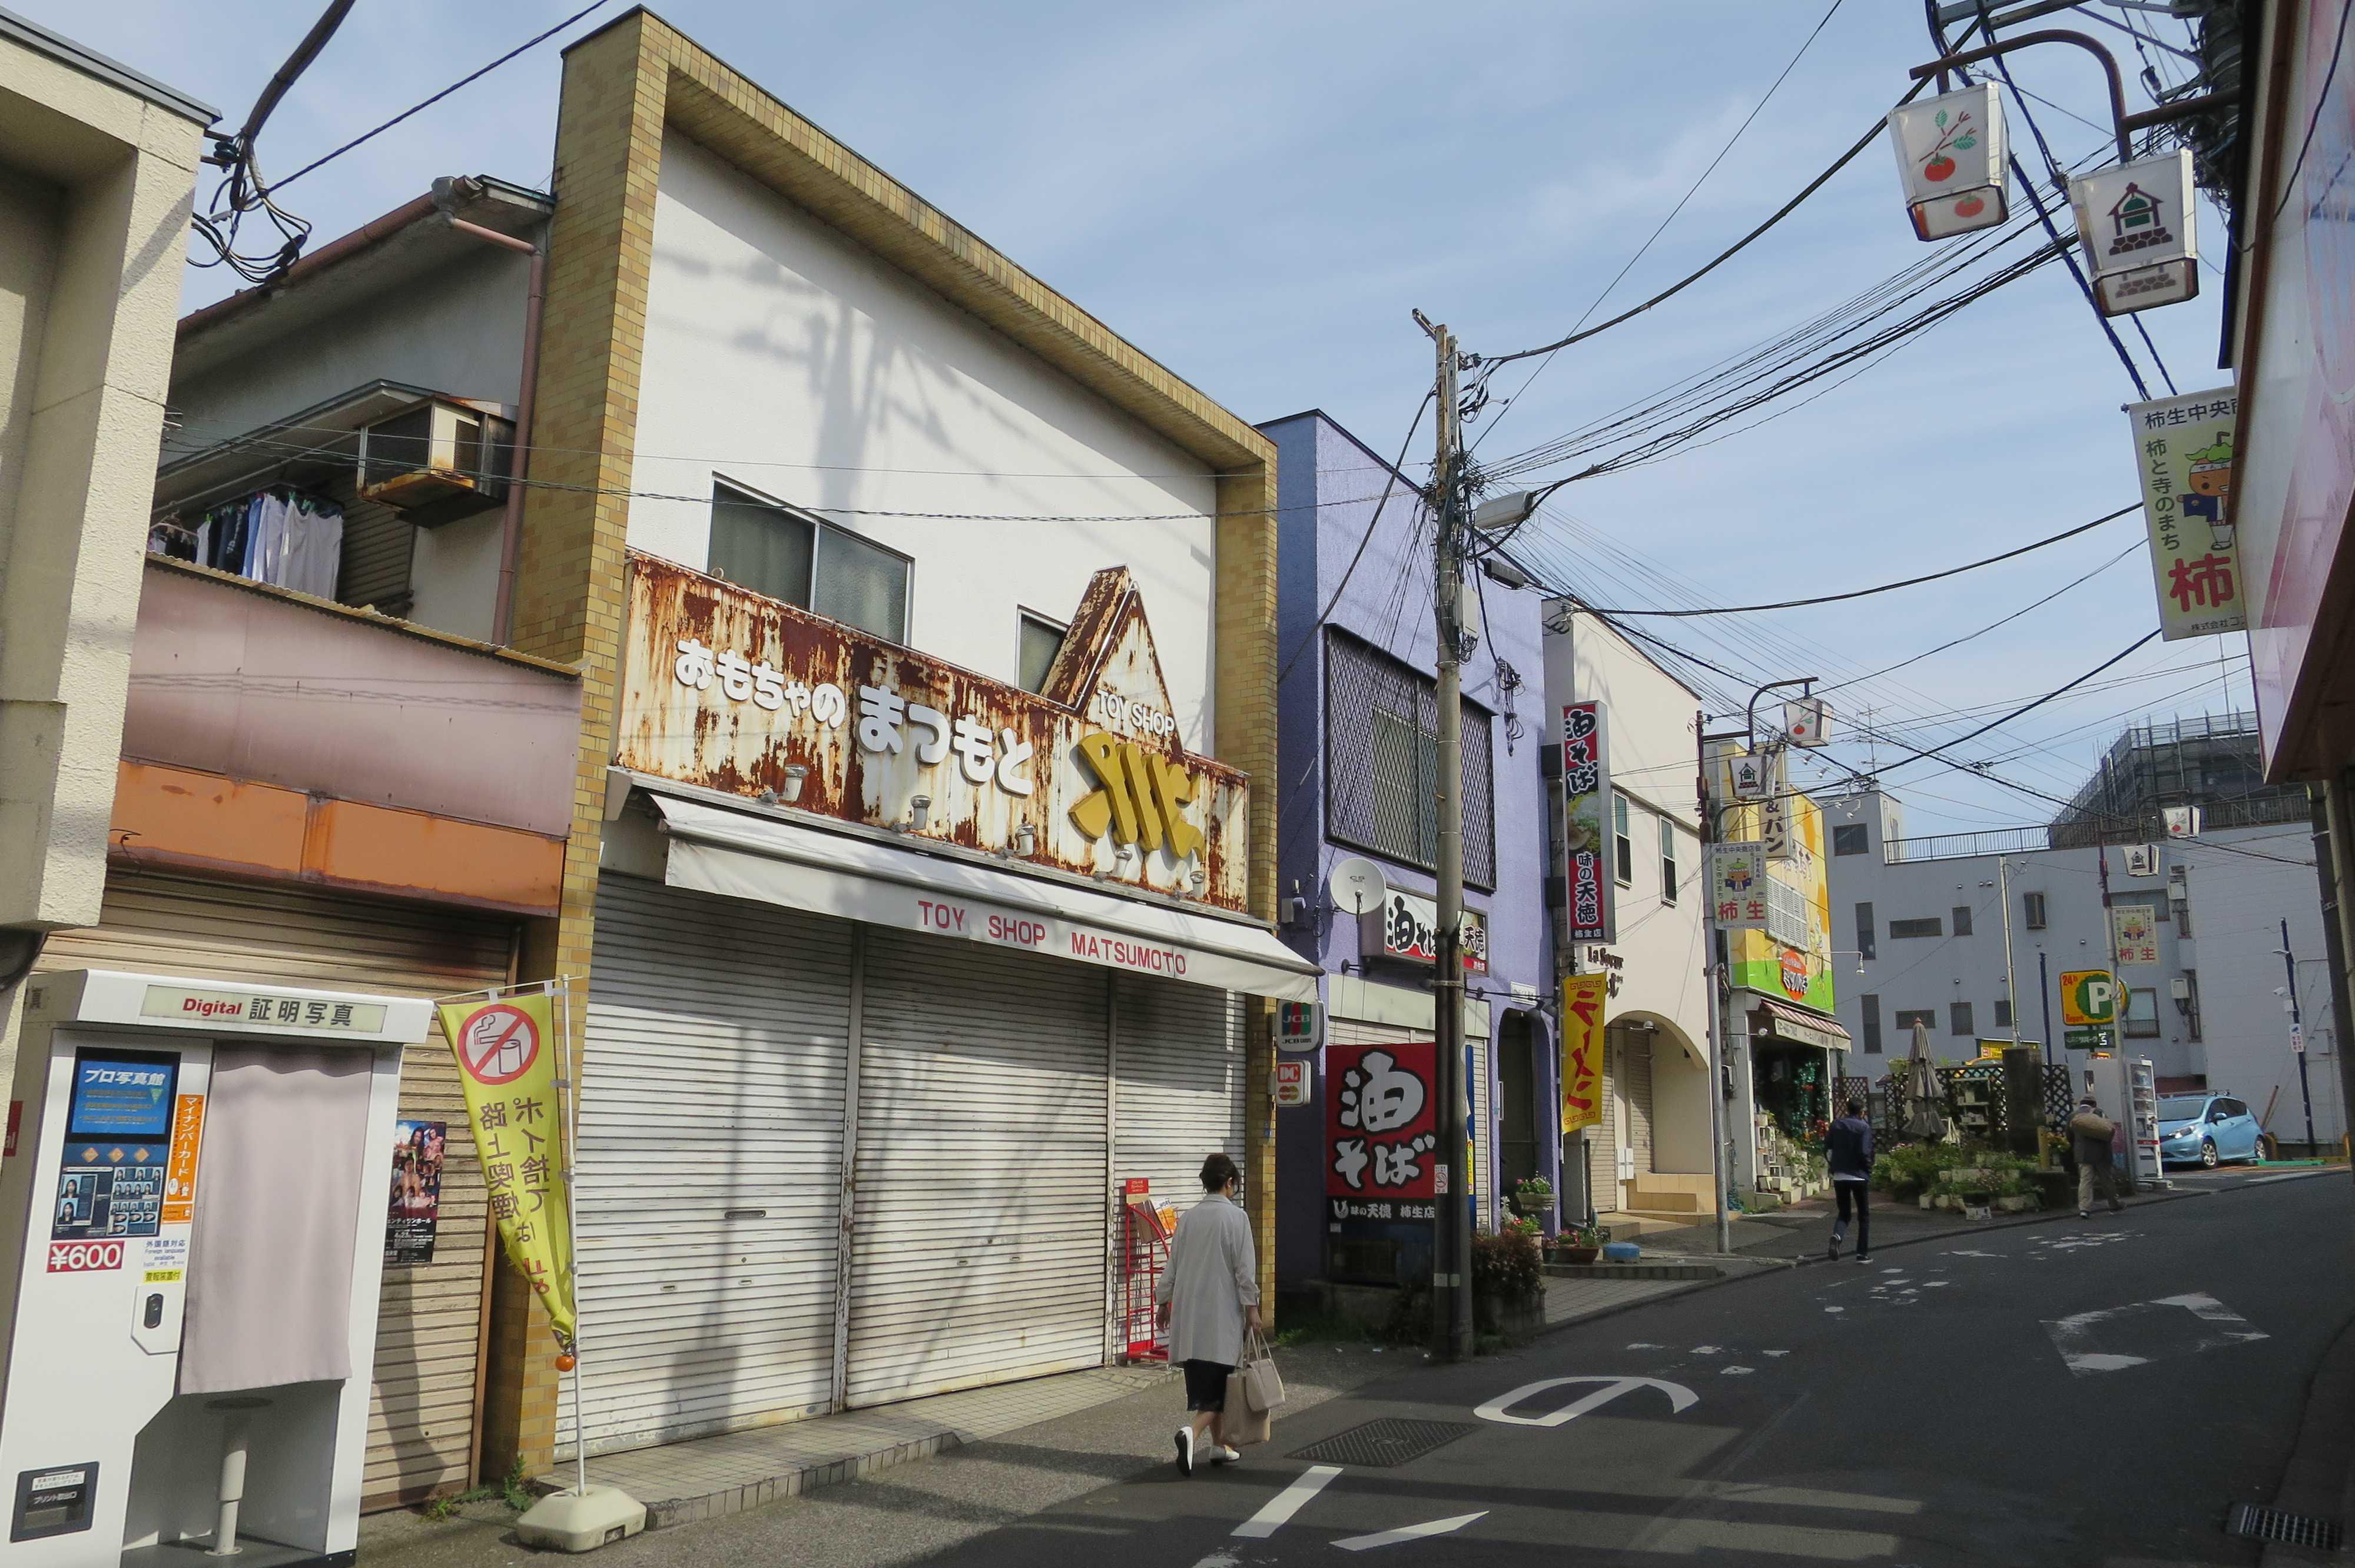 小田急柿生駅前の商店街